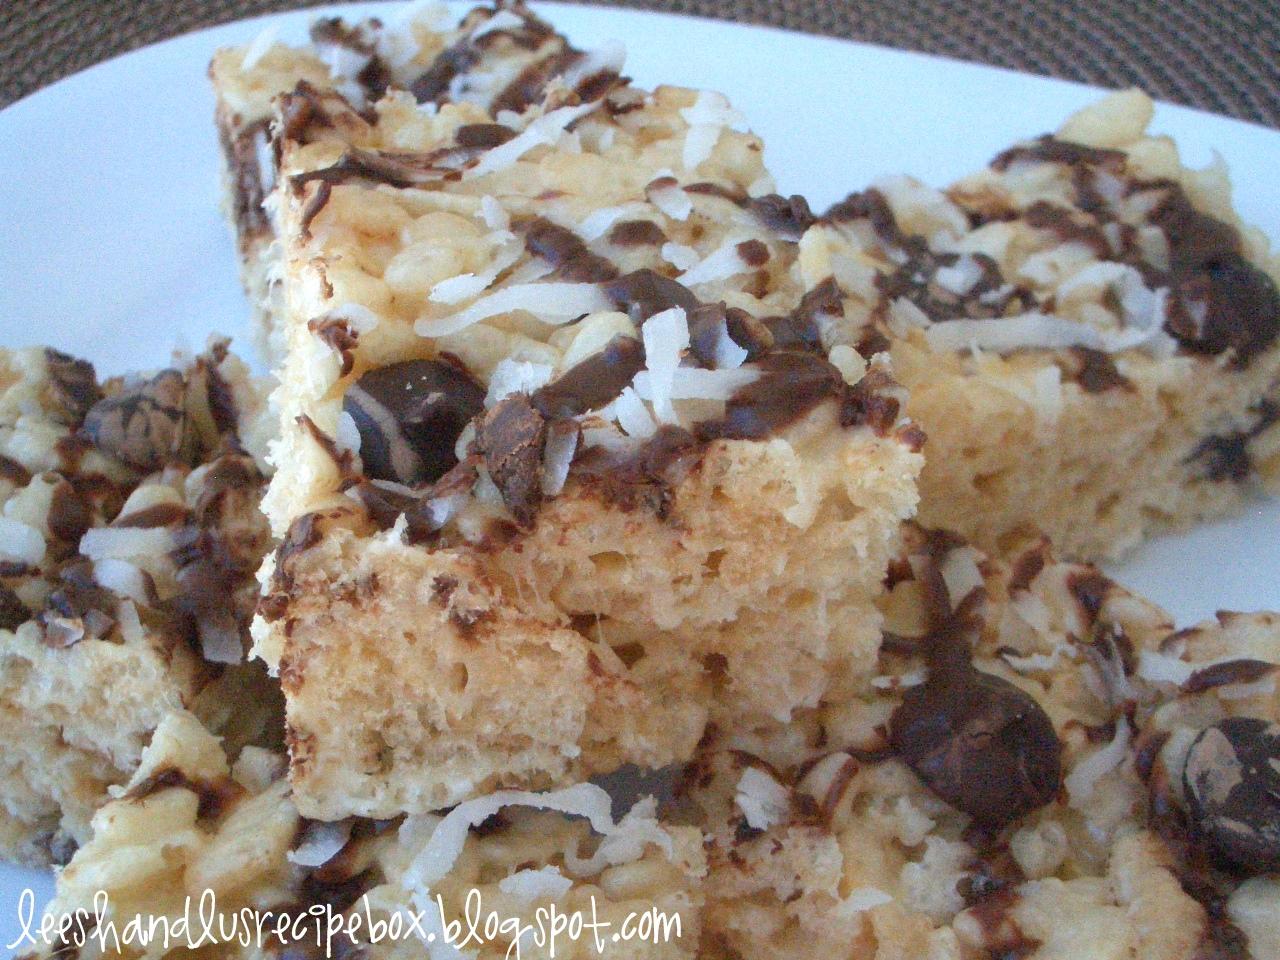 Leesh & Lu's Recipe Box: Coconut-Chocolate Rice Crispy Treats